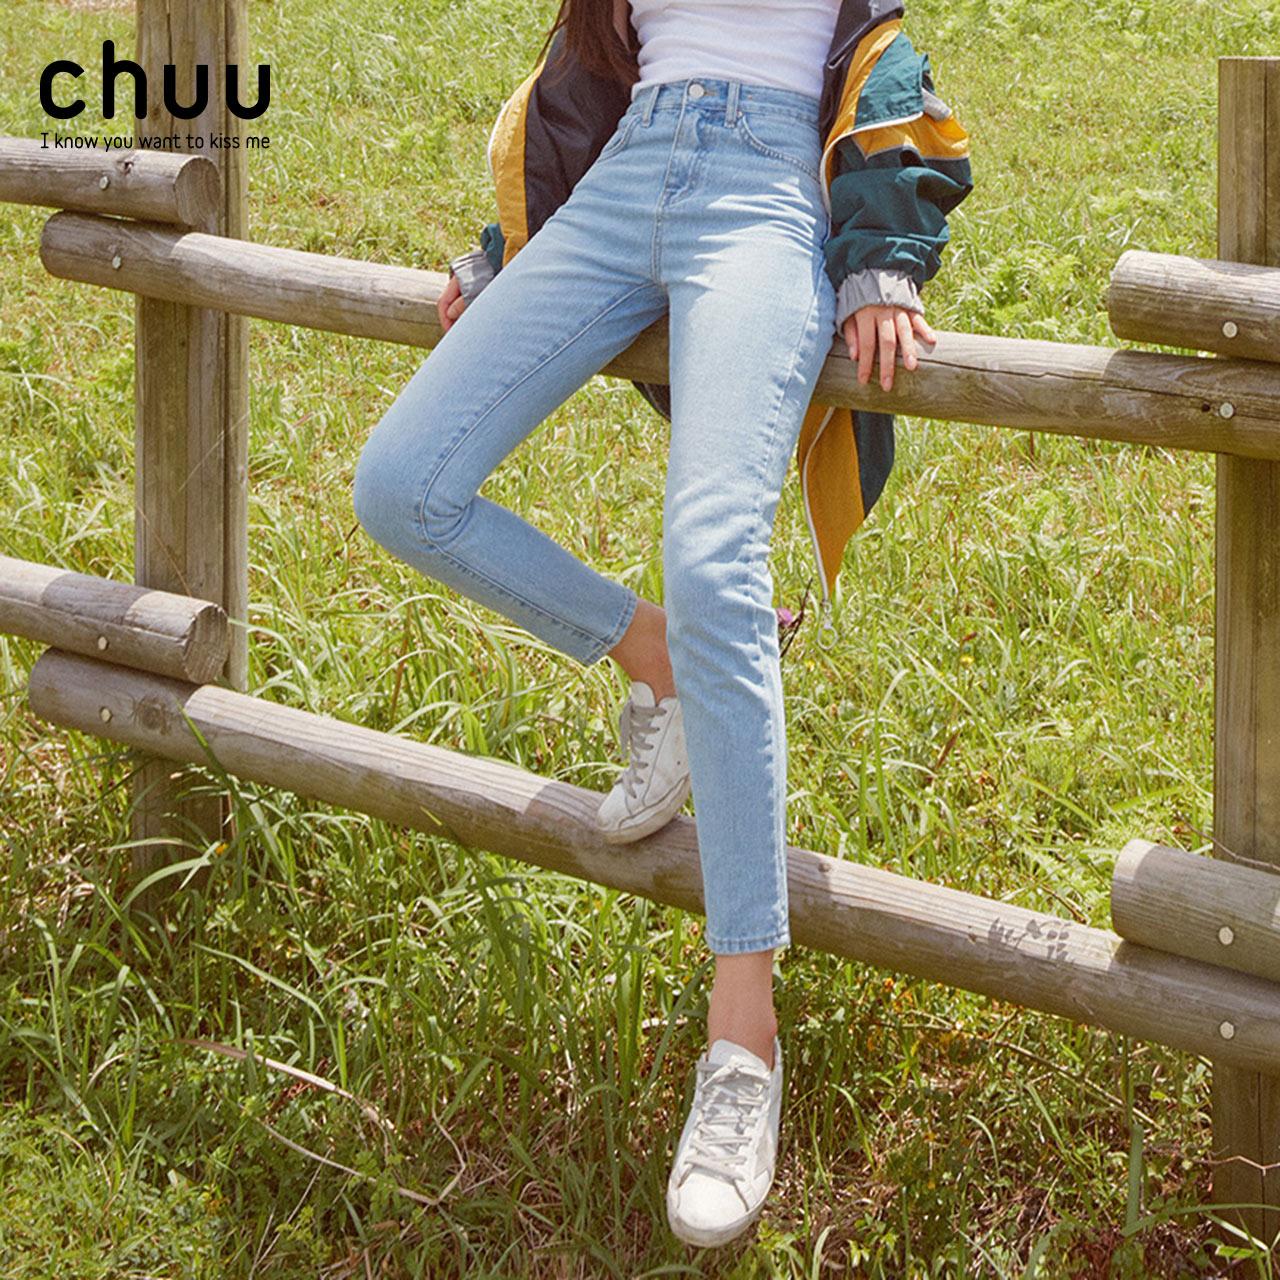 chuu-5kg牛仔裤女夏2019秋季新款高腰浅色松紧腰提臀直筒小脚裤子